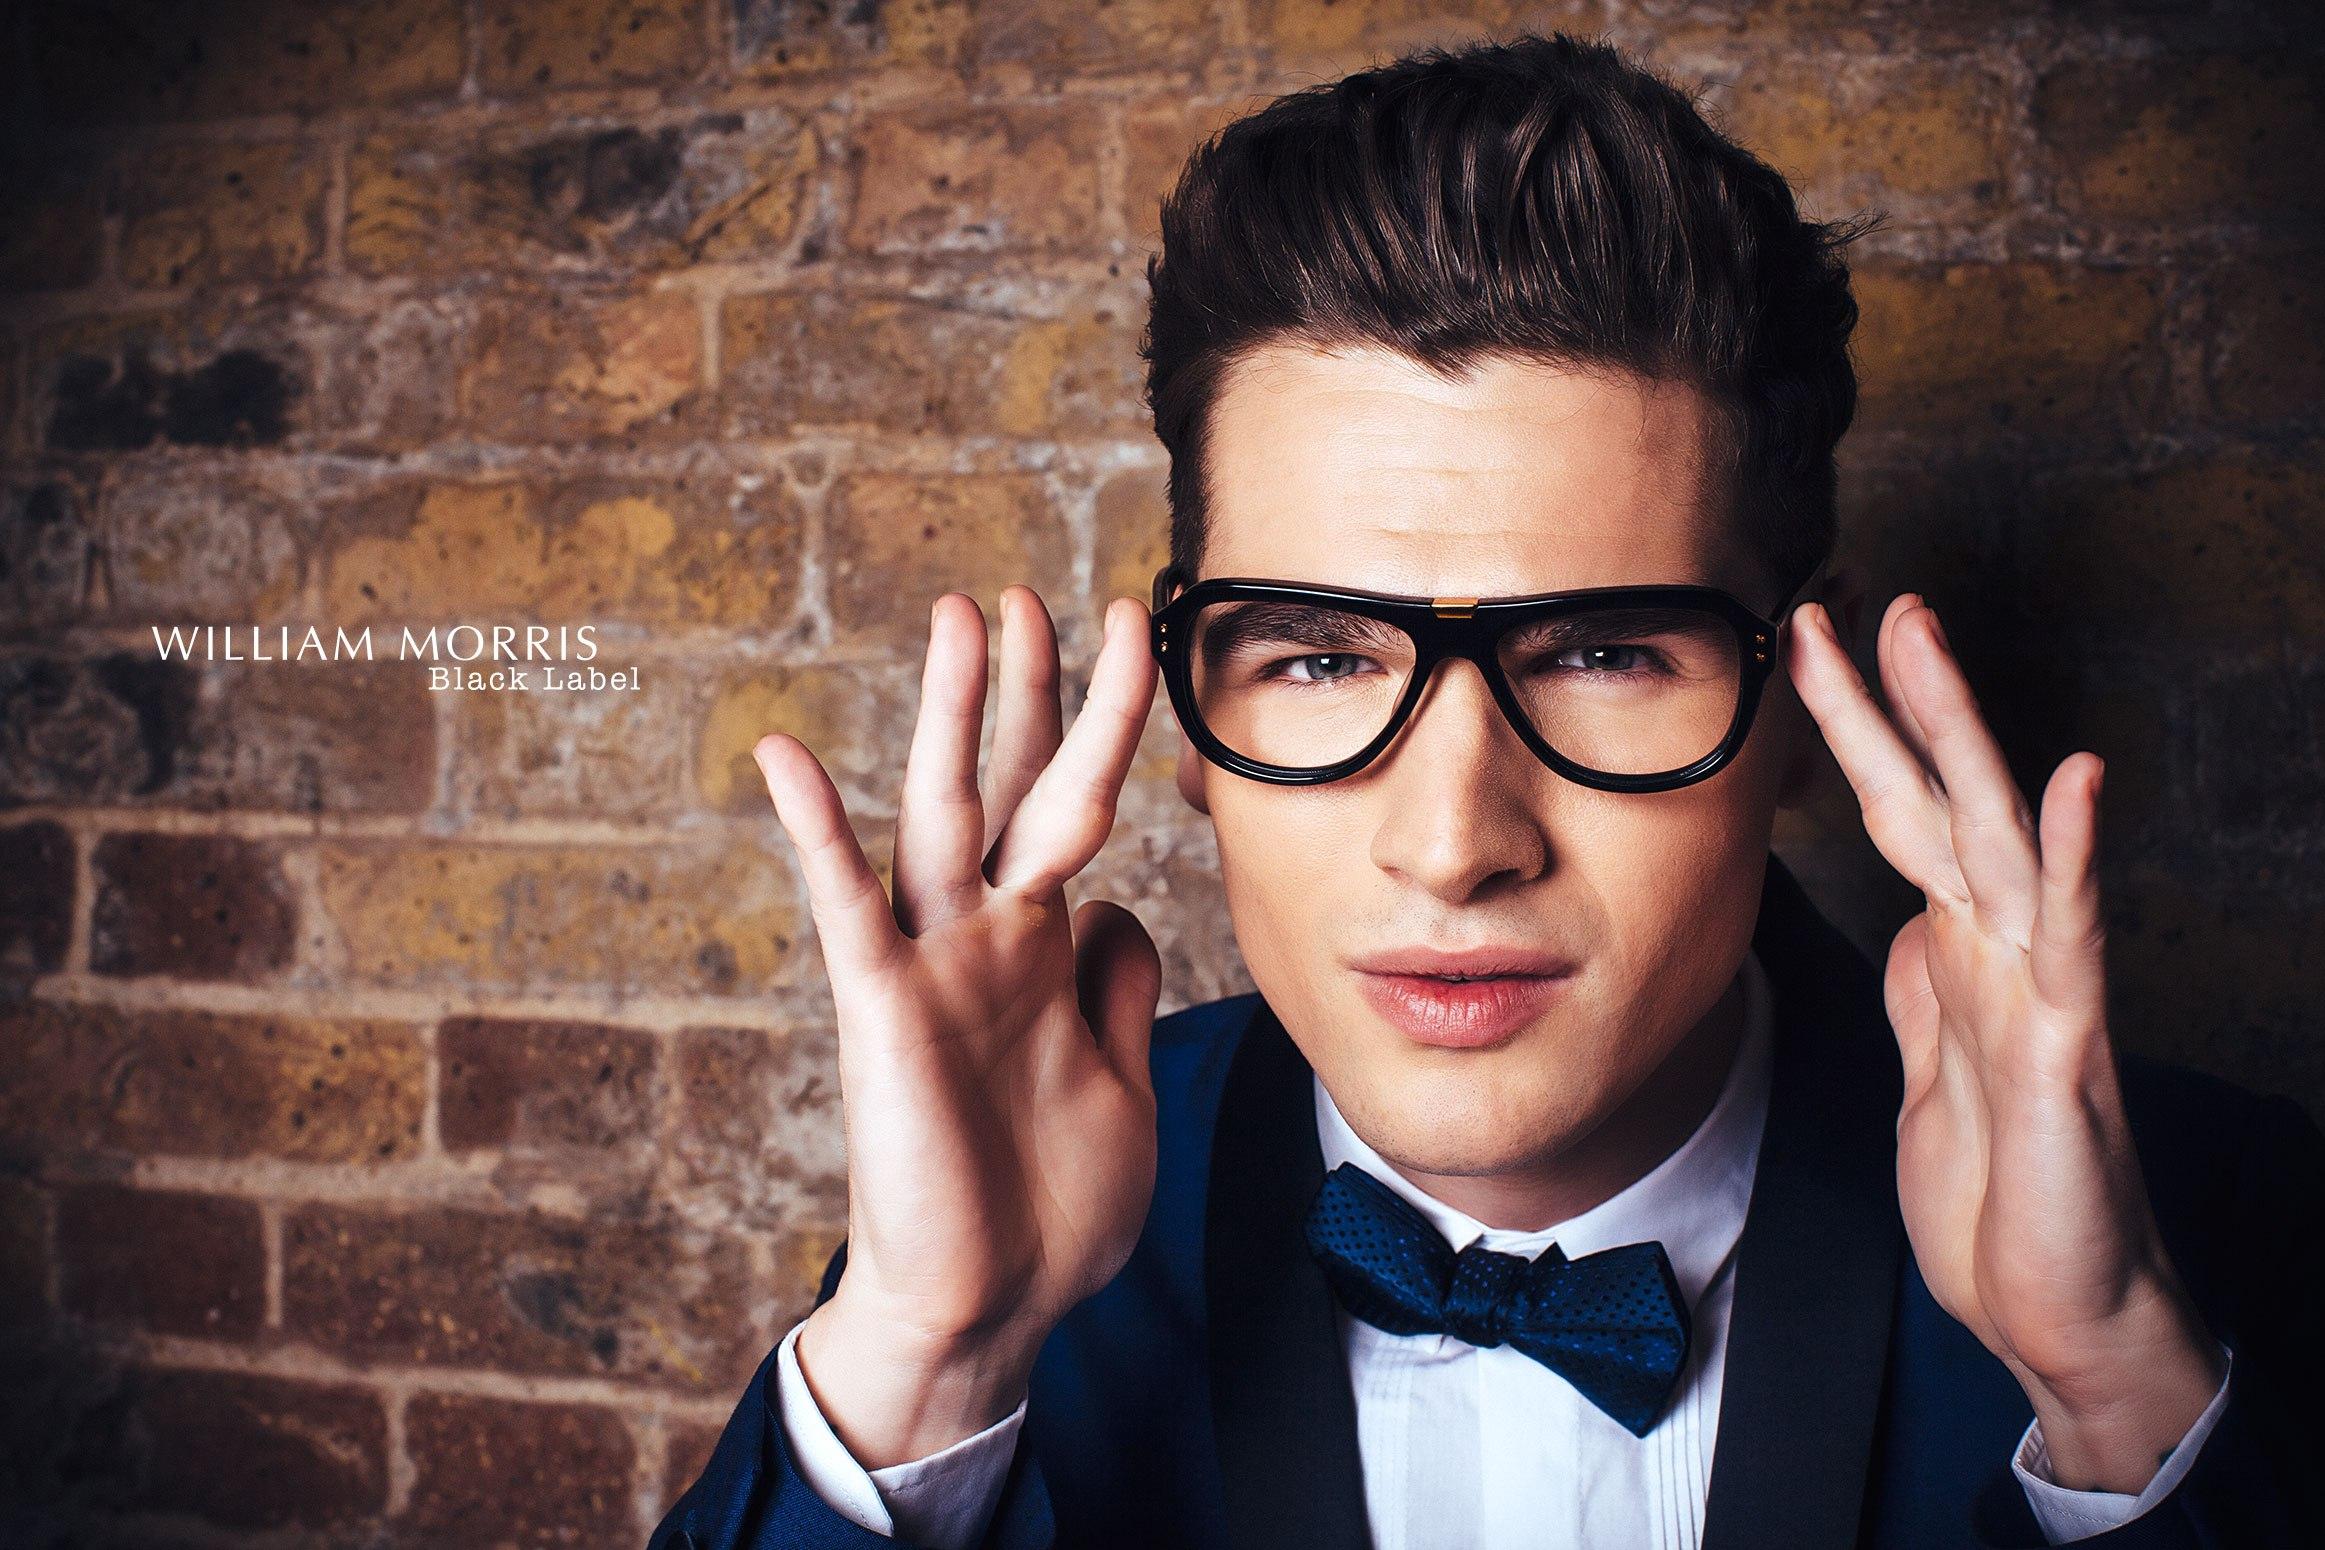 william-morris-london-black-label-2014-campaign-glasses-eyewear-7